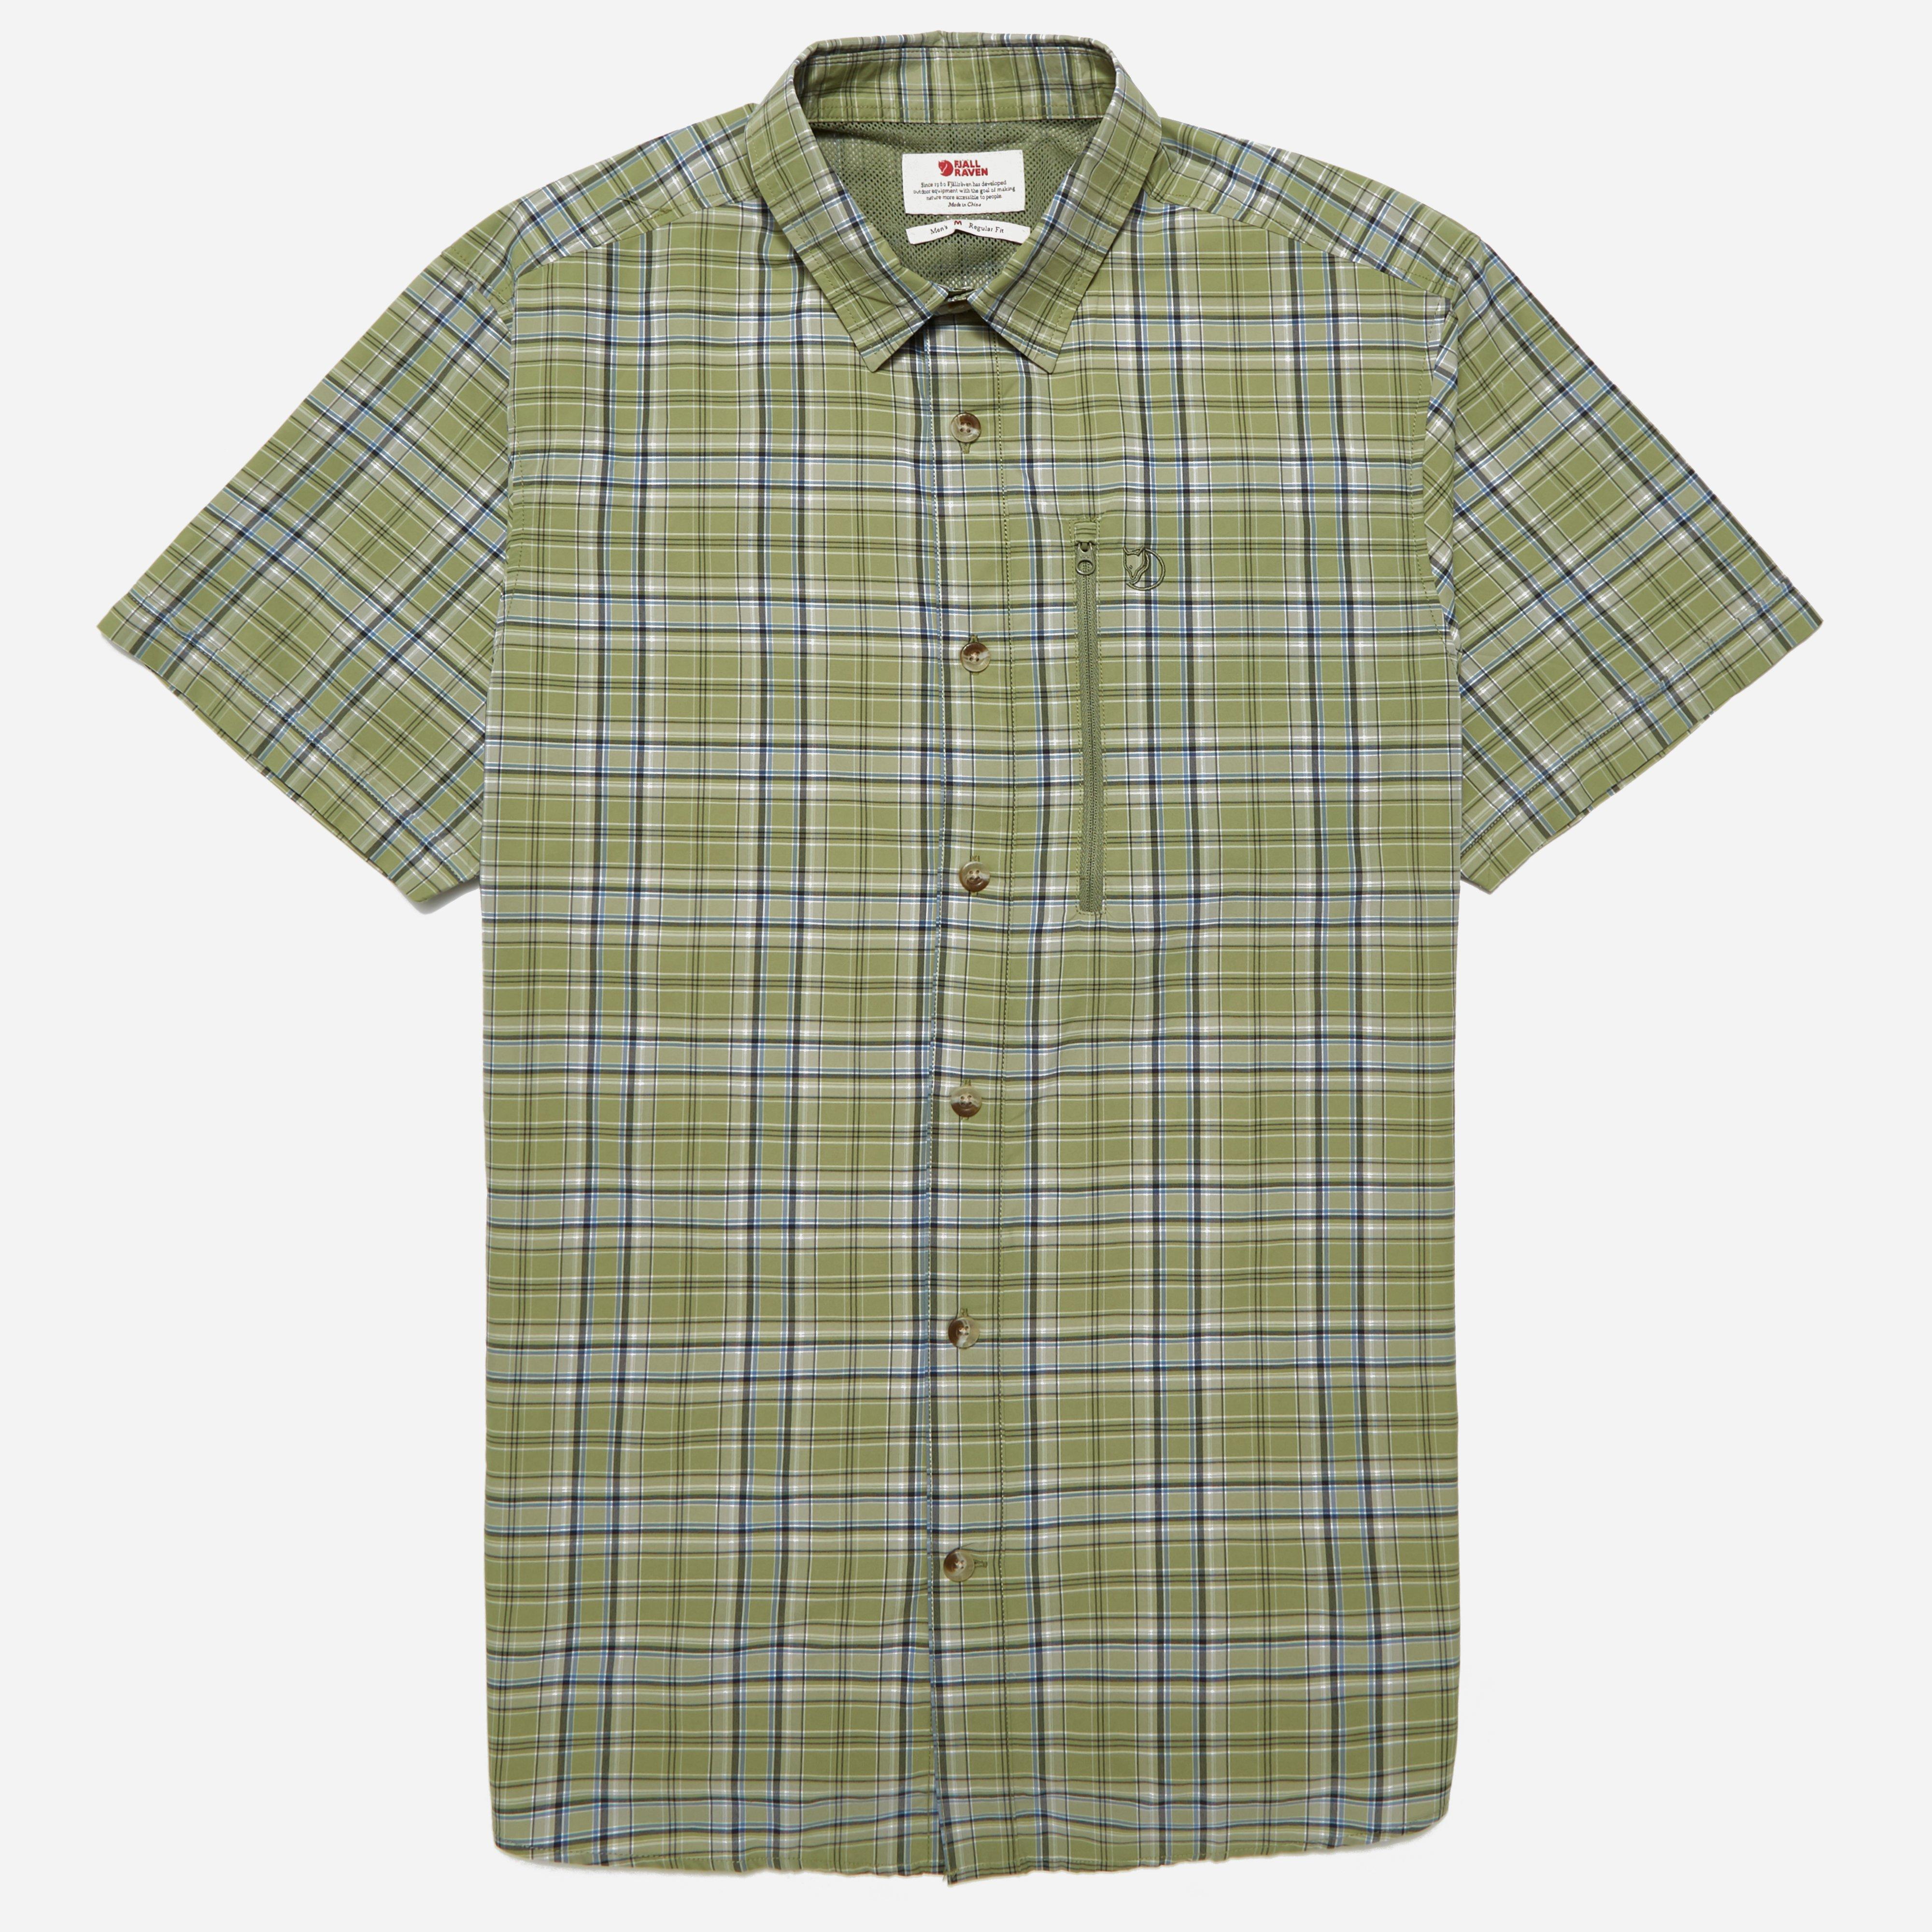 Fjallraven Abisko Short Sleeve Hike Shirt